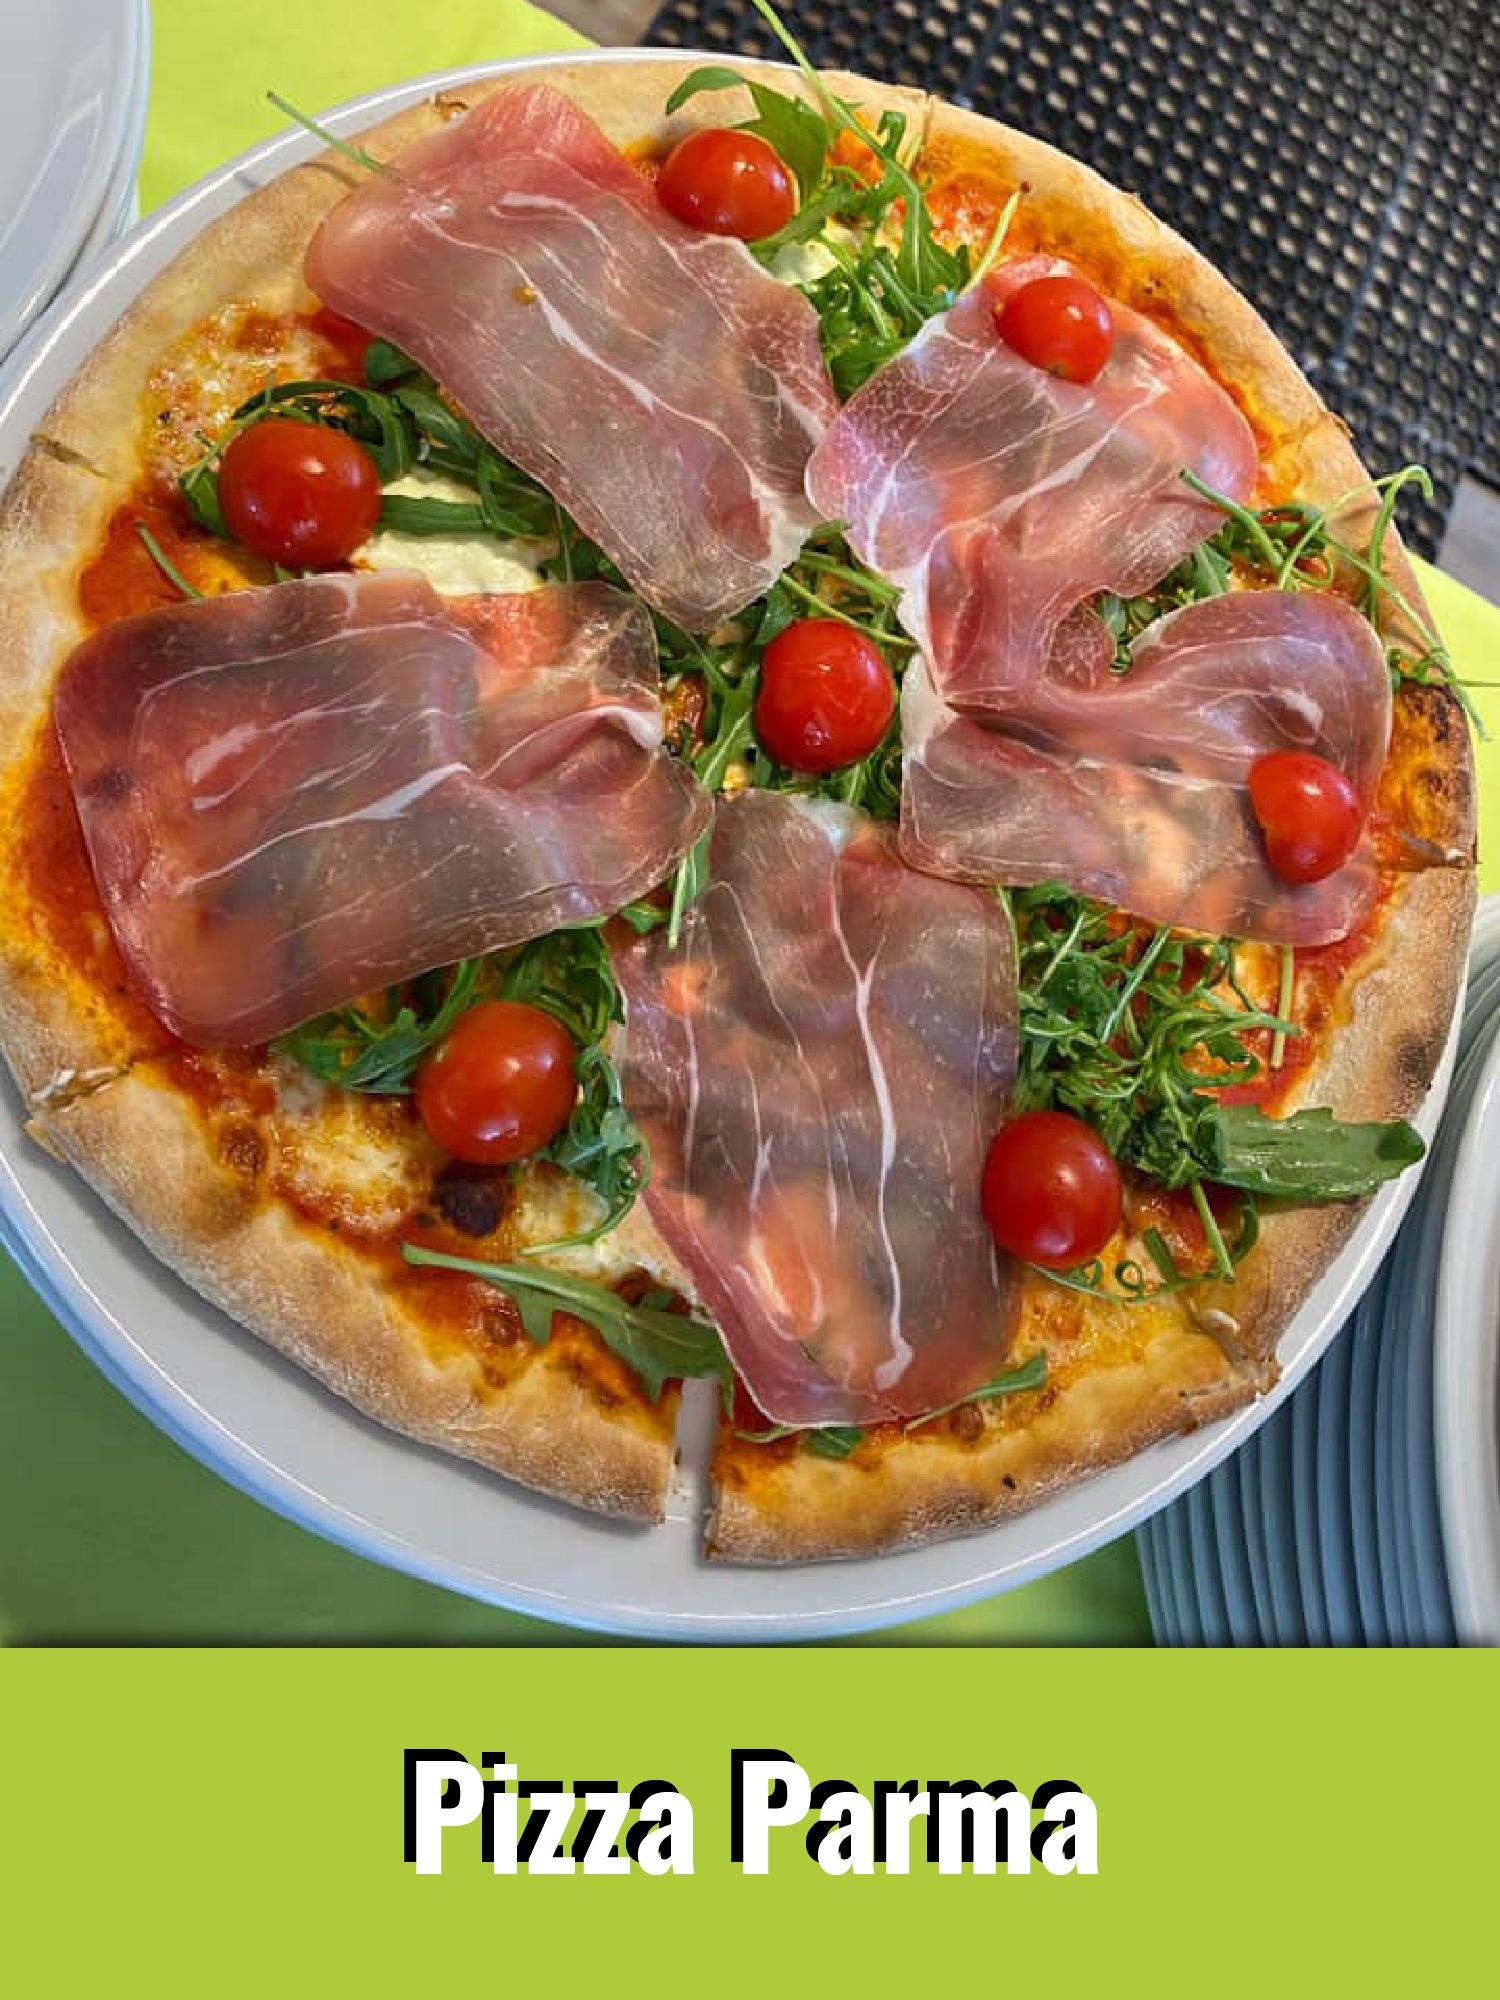 Edelweiss-Pizzeria-Restaurant-Appenzell-Pizza-Parma